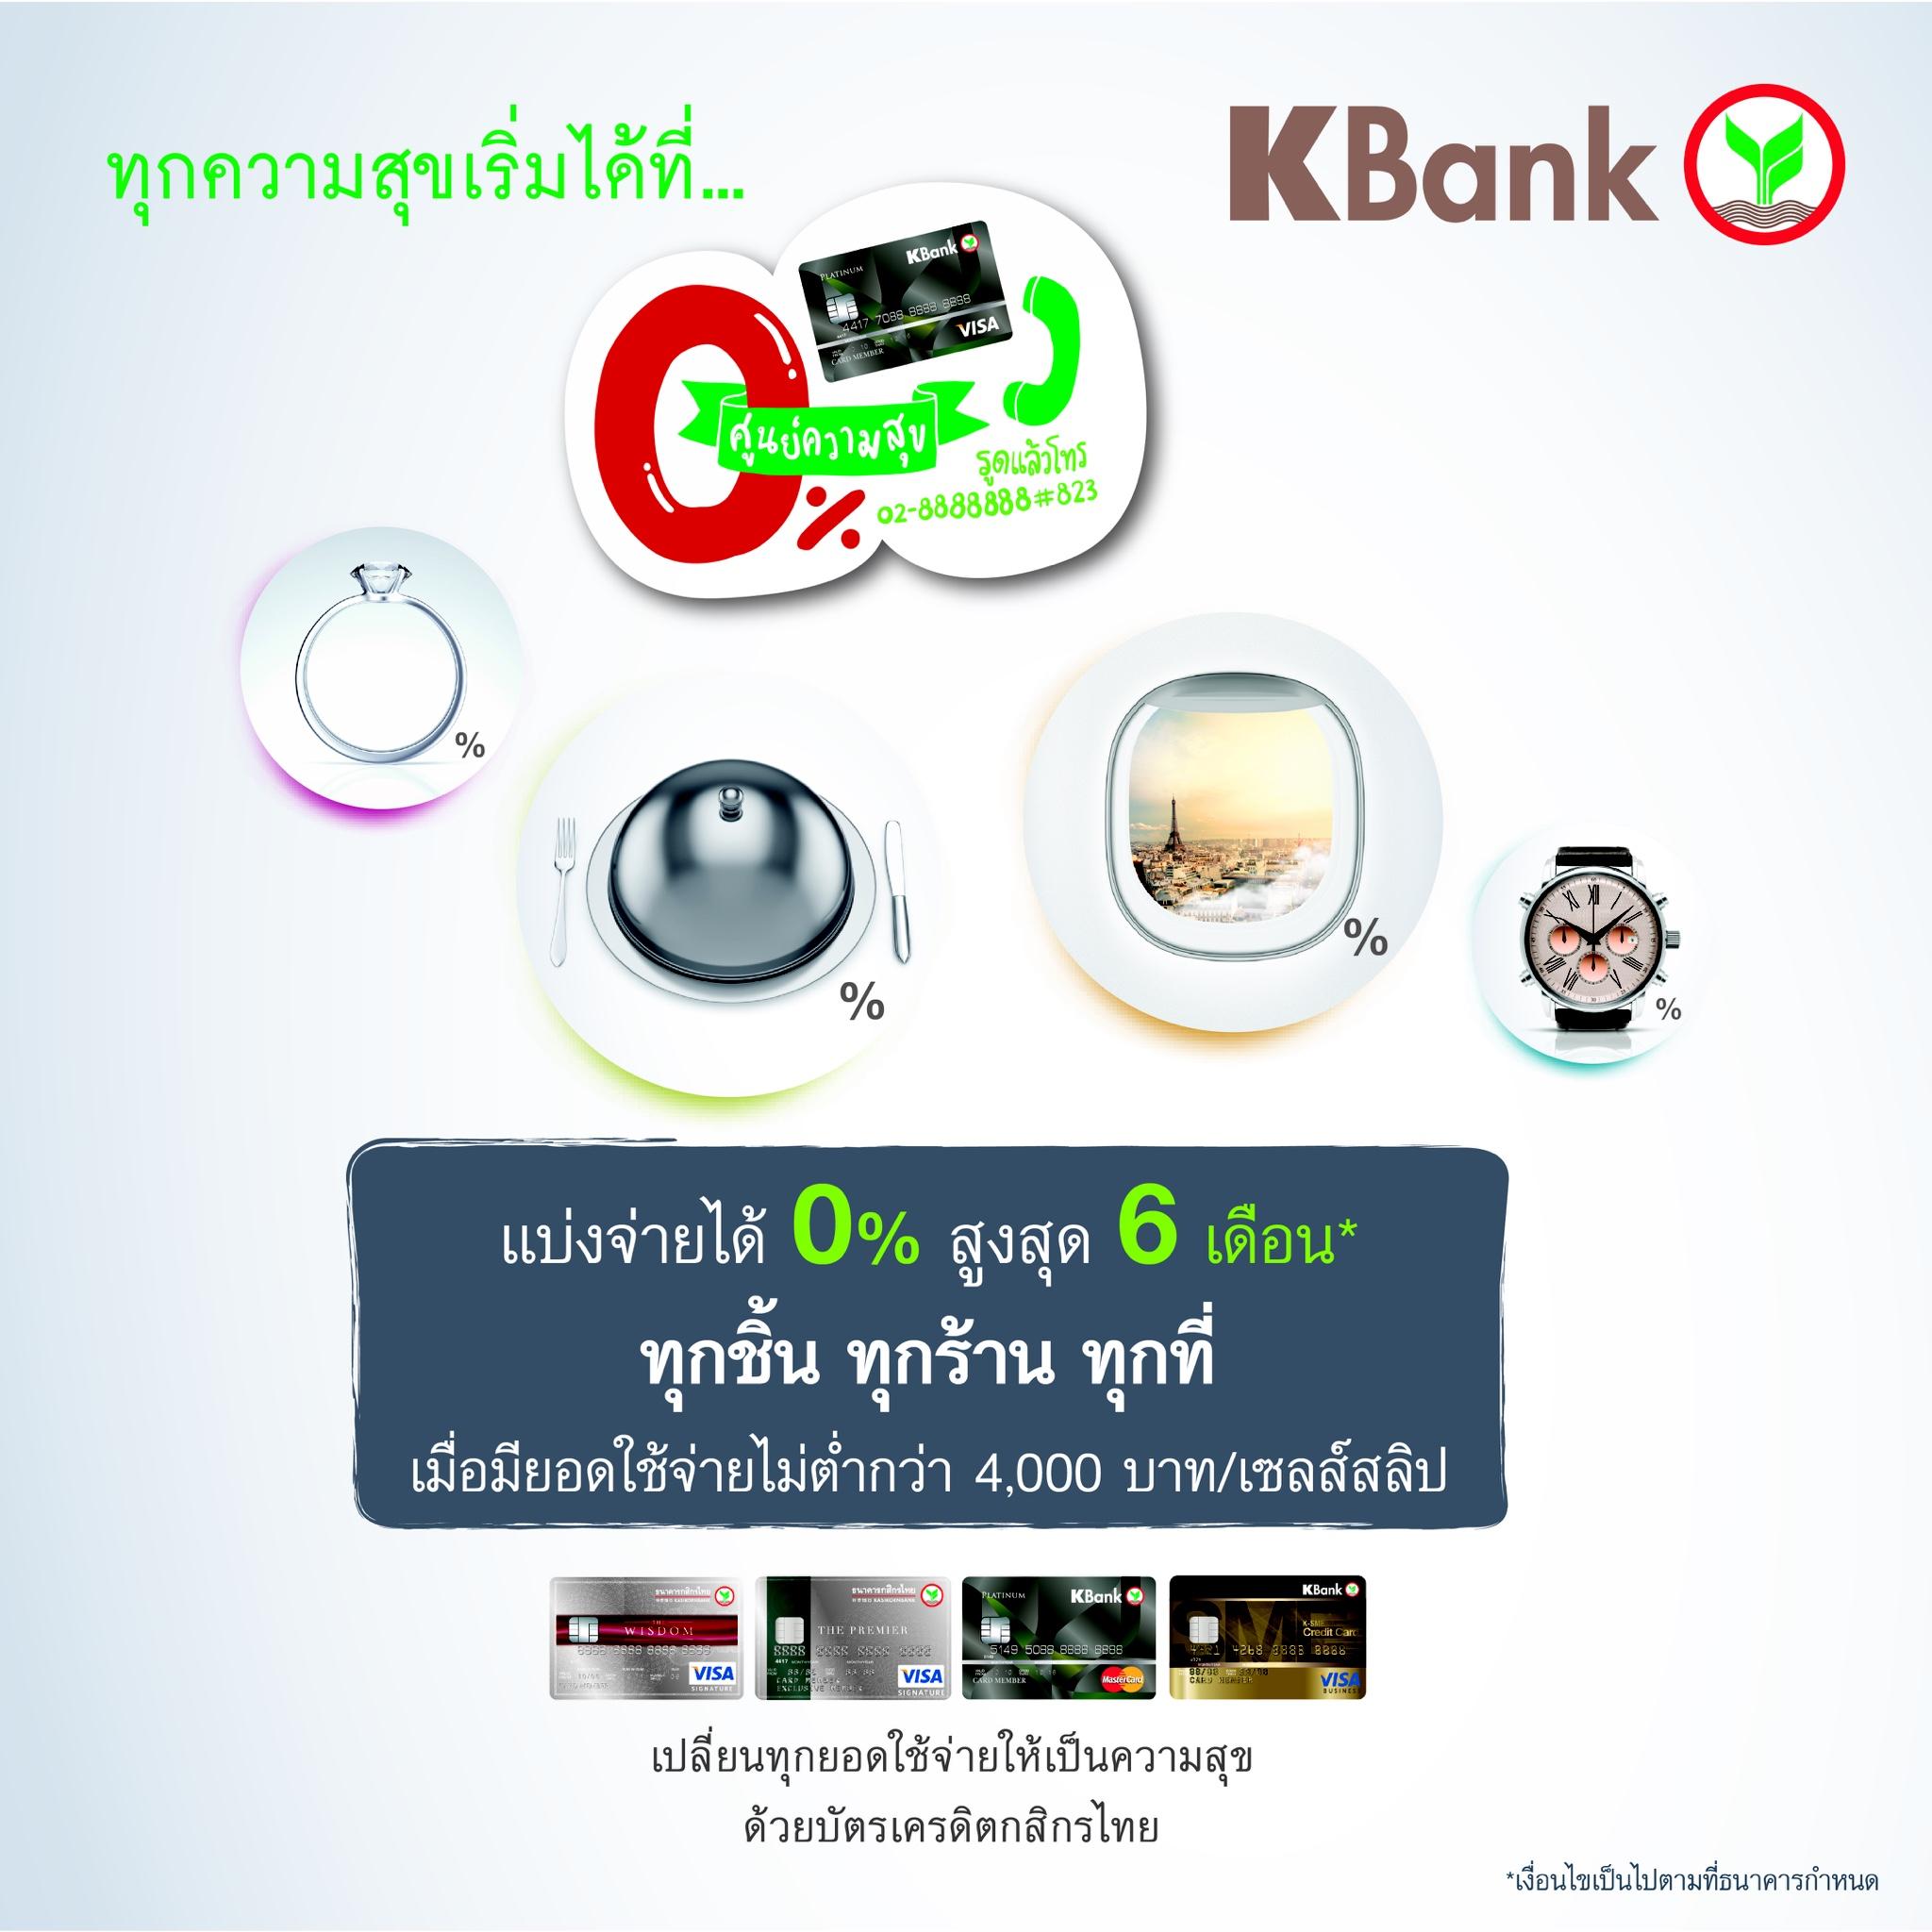 Promotion Kbank Happiness 0 Percent Plan